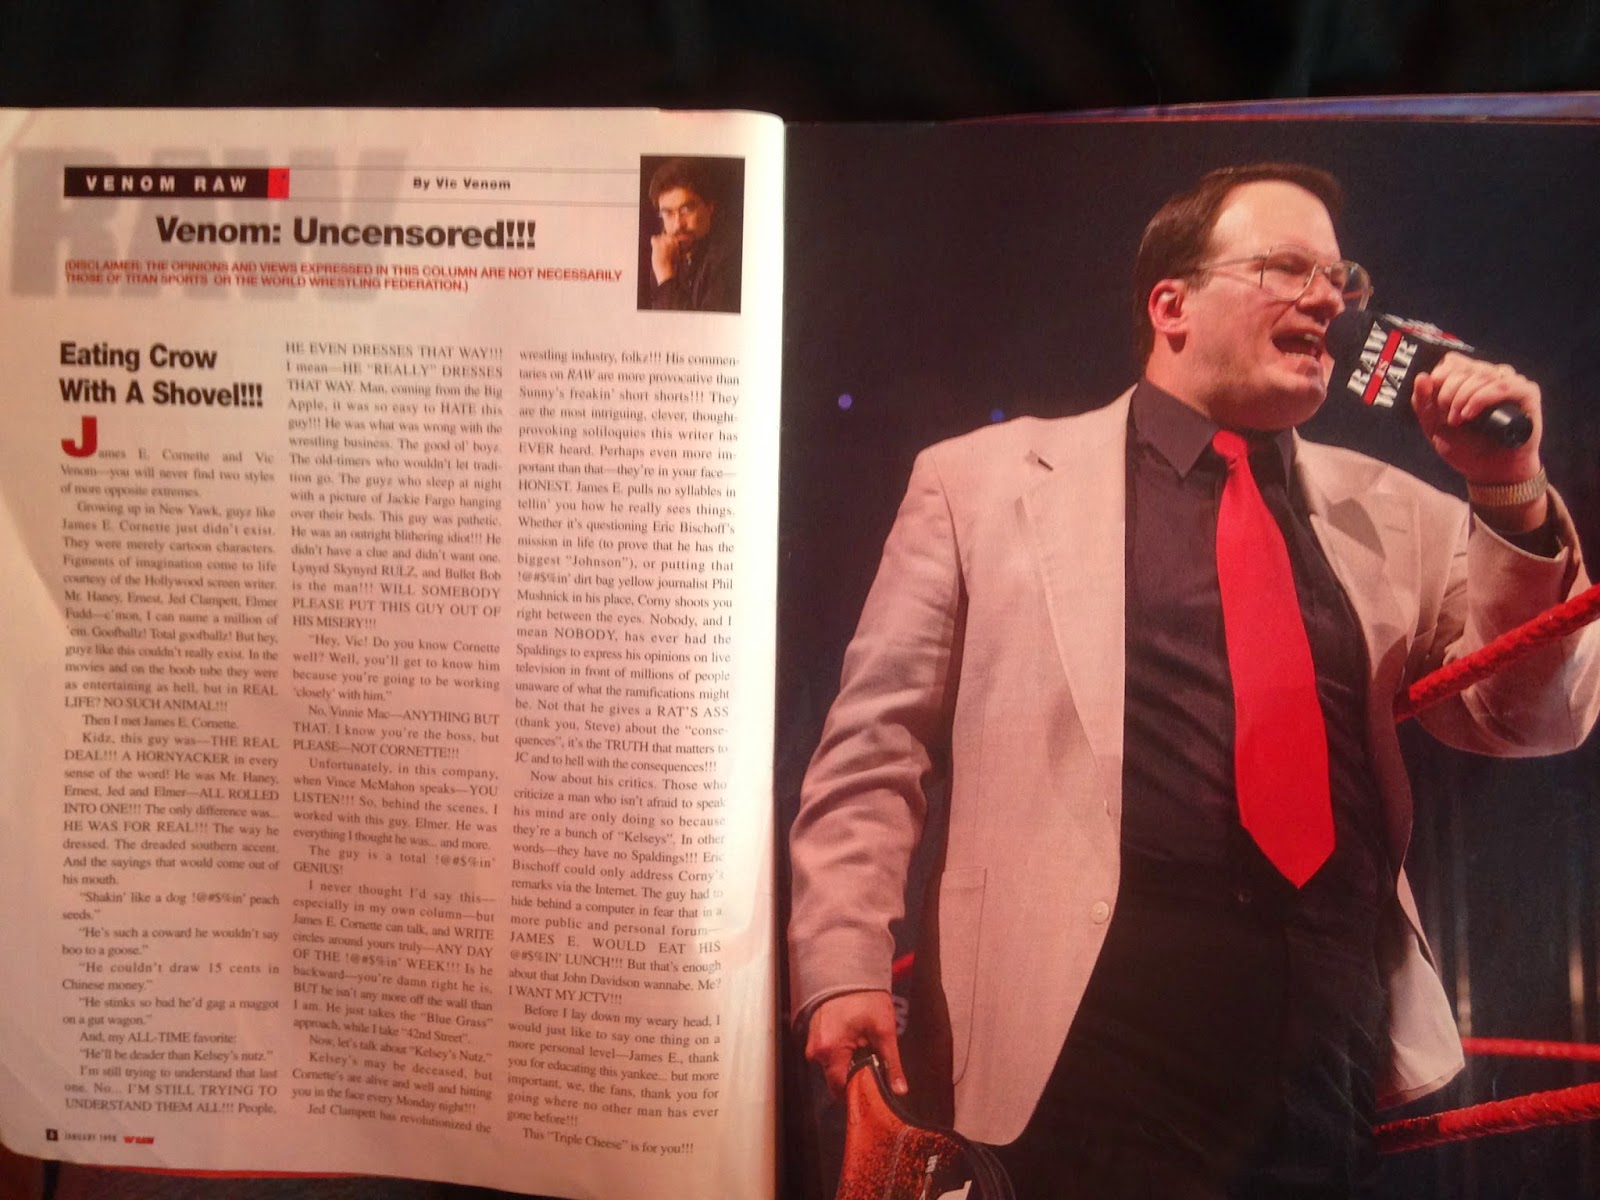 WWE - WWF Raw Magazine - January 1998 - Vince Russo shoots on Jim Cornette